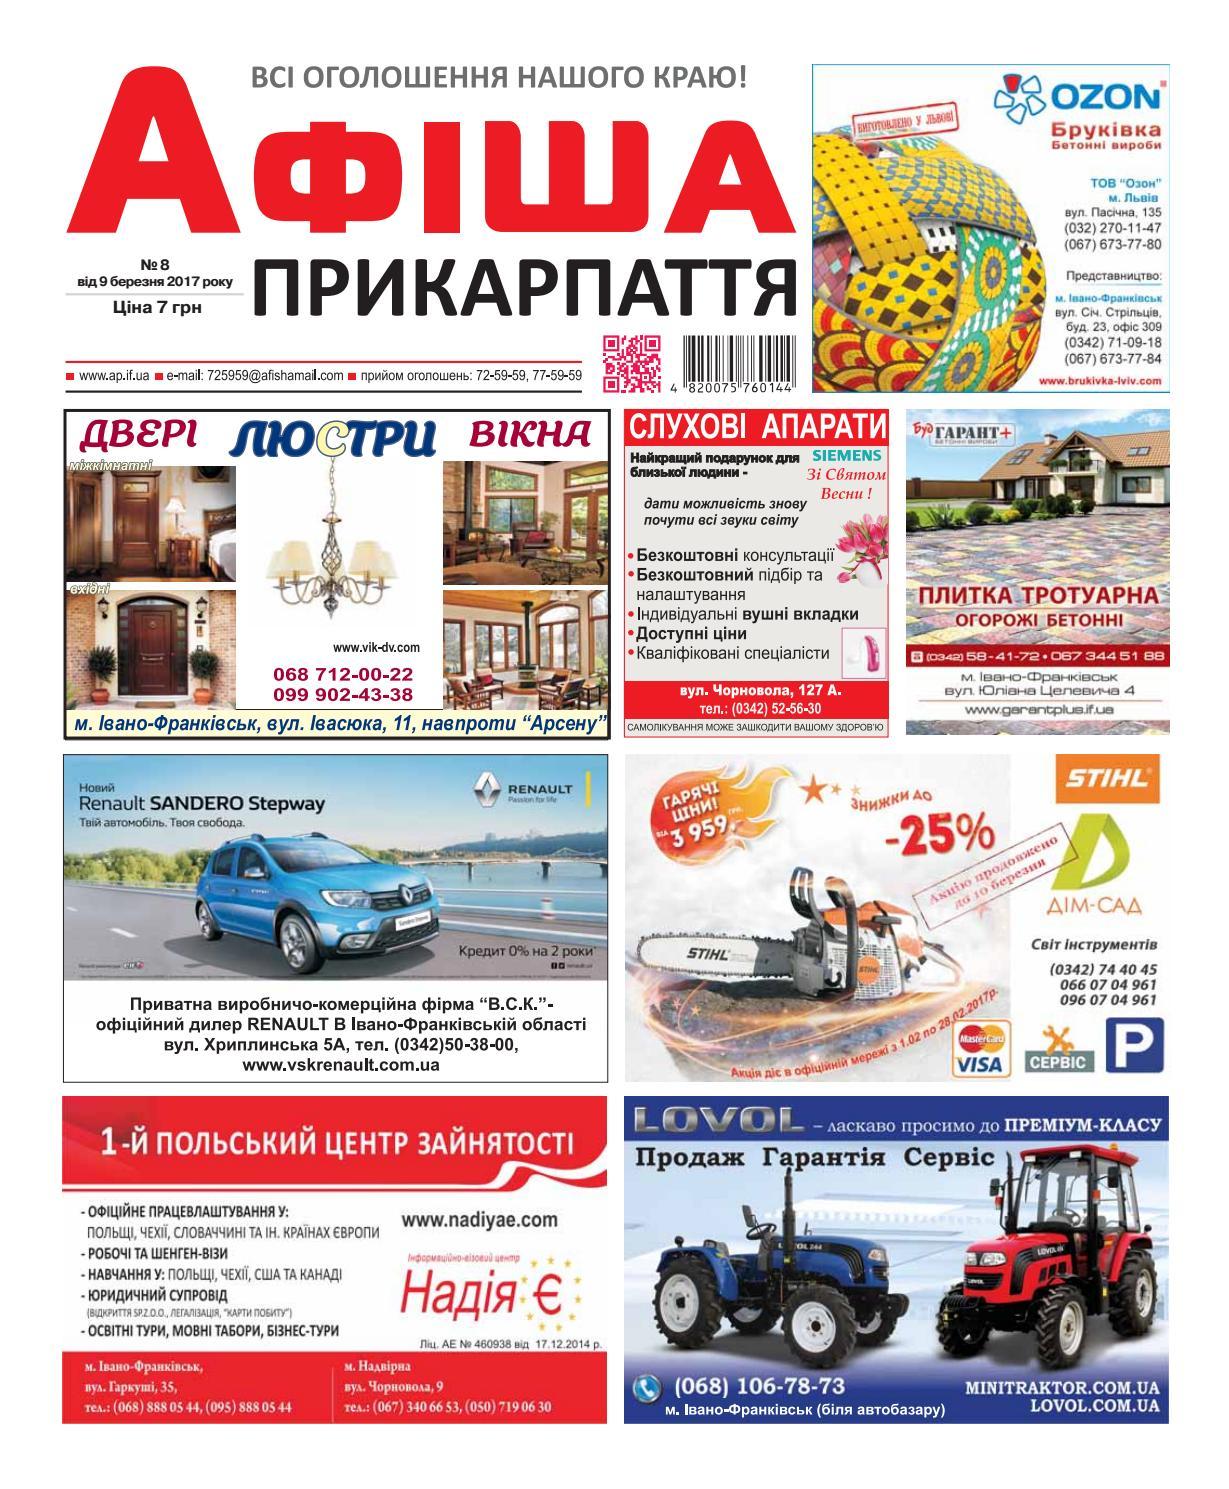 Афіша Прикарпаття №8 by Olya Olya - issuu 72c4033bf2591